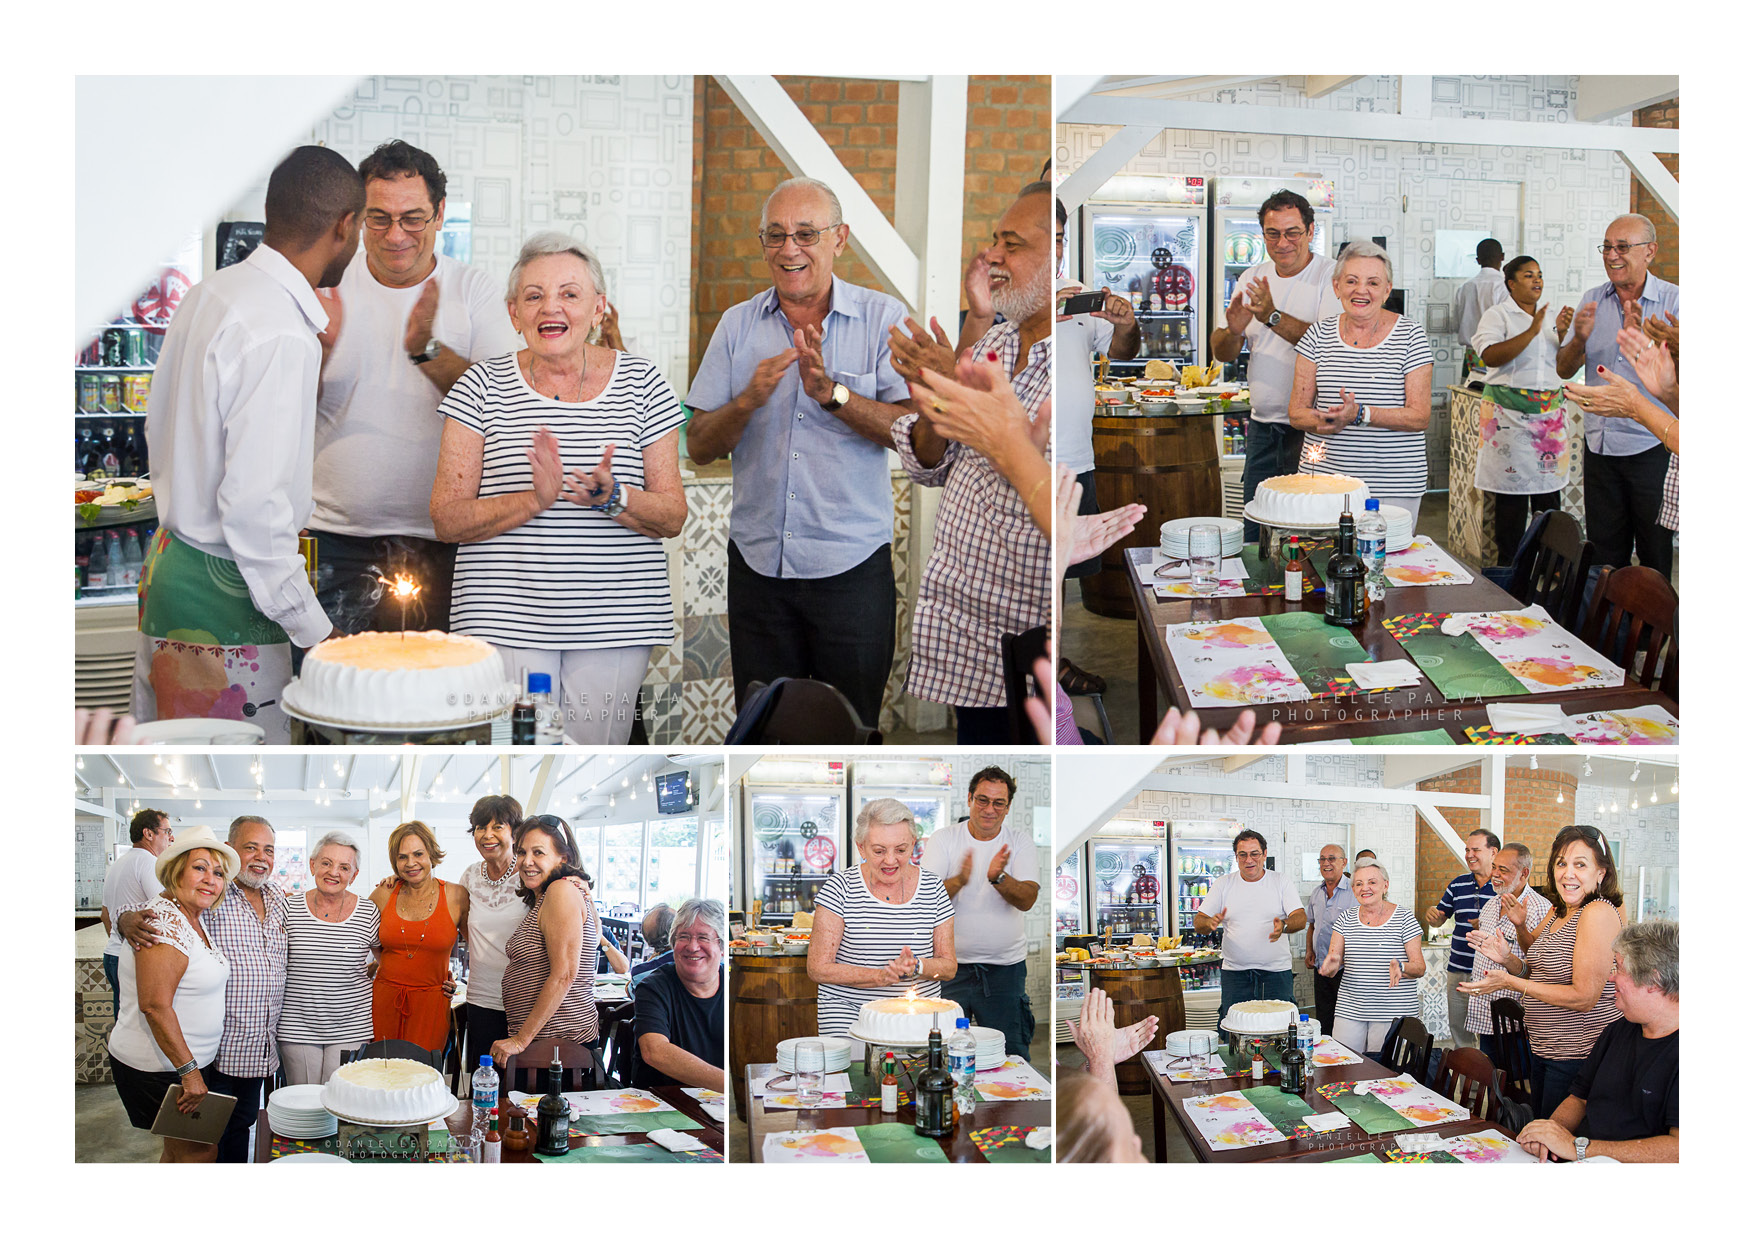 festa-niteroi-restaurante-eventos-tra-i-gusti-5